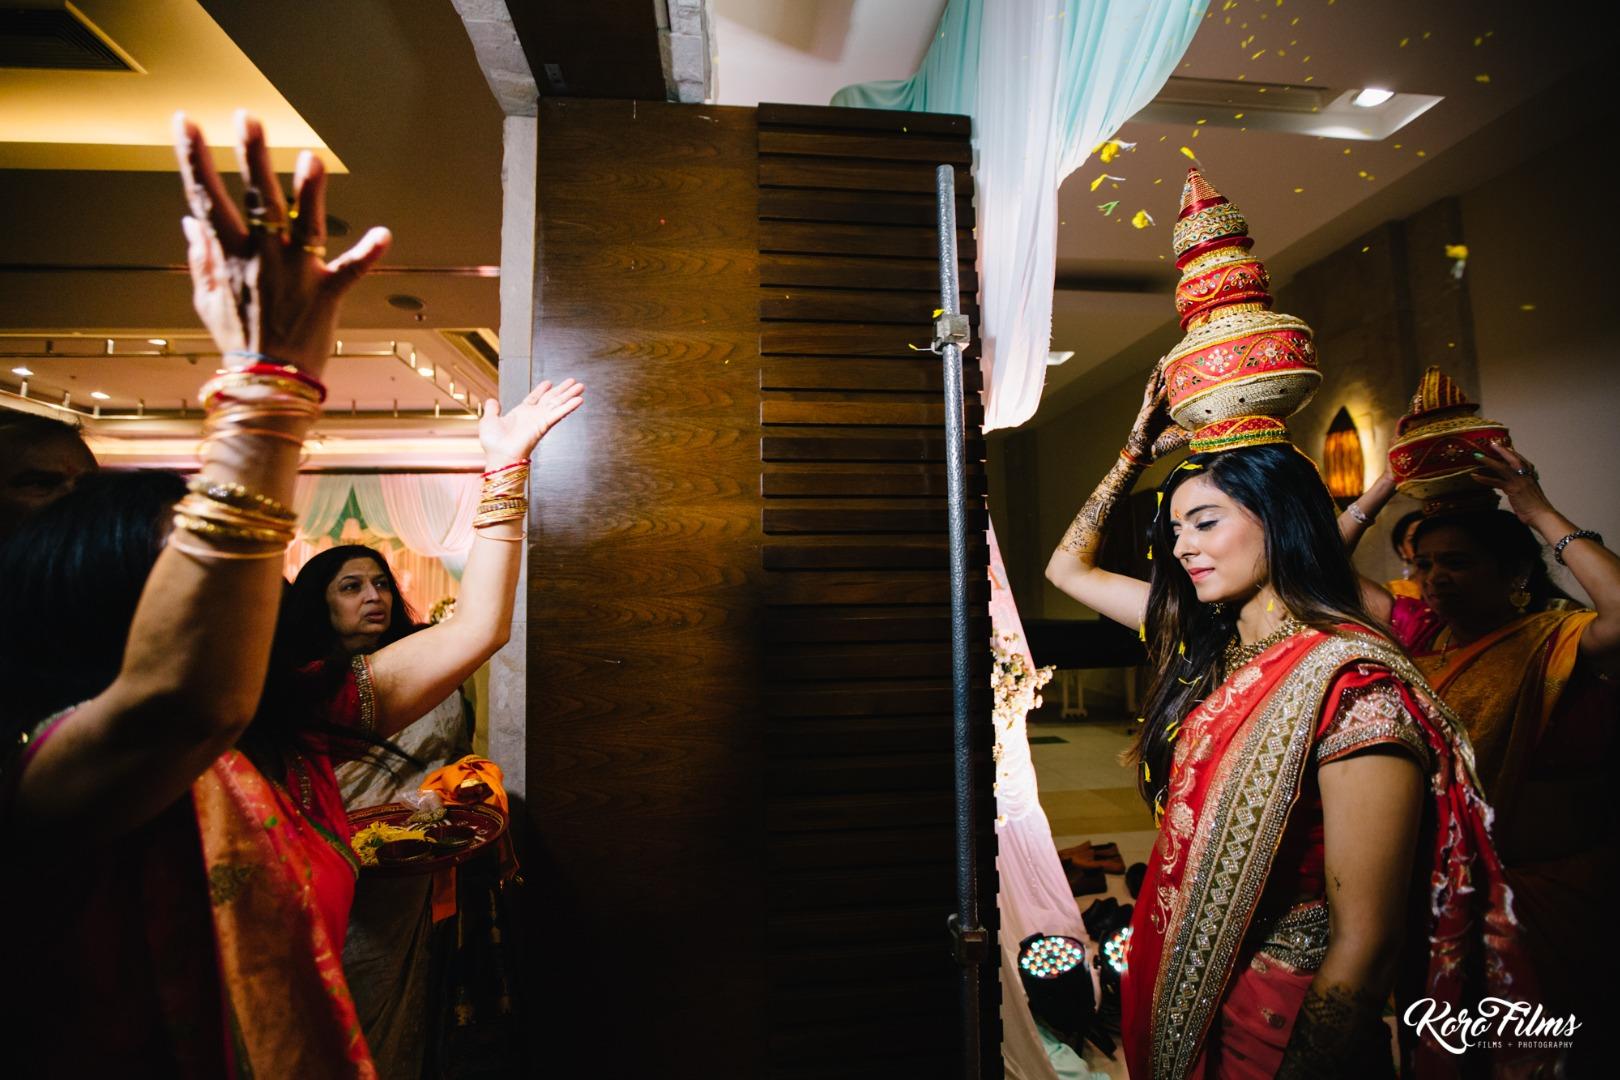 indianwedding in Thailand